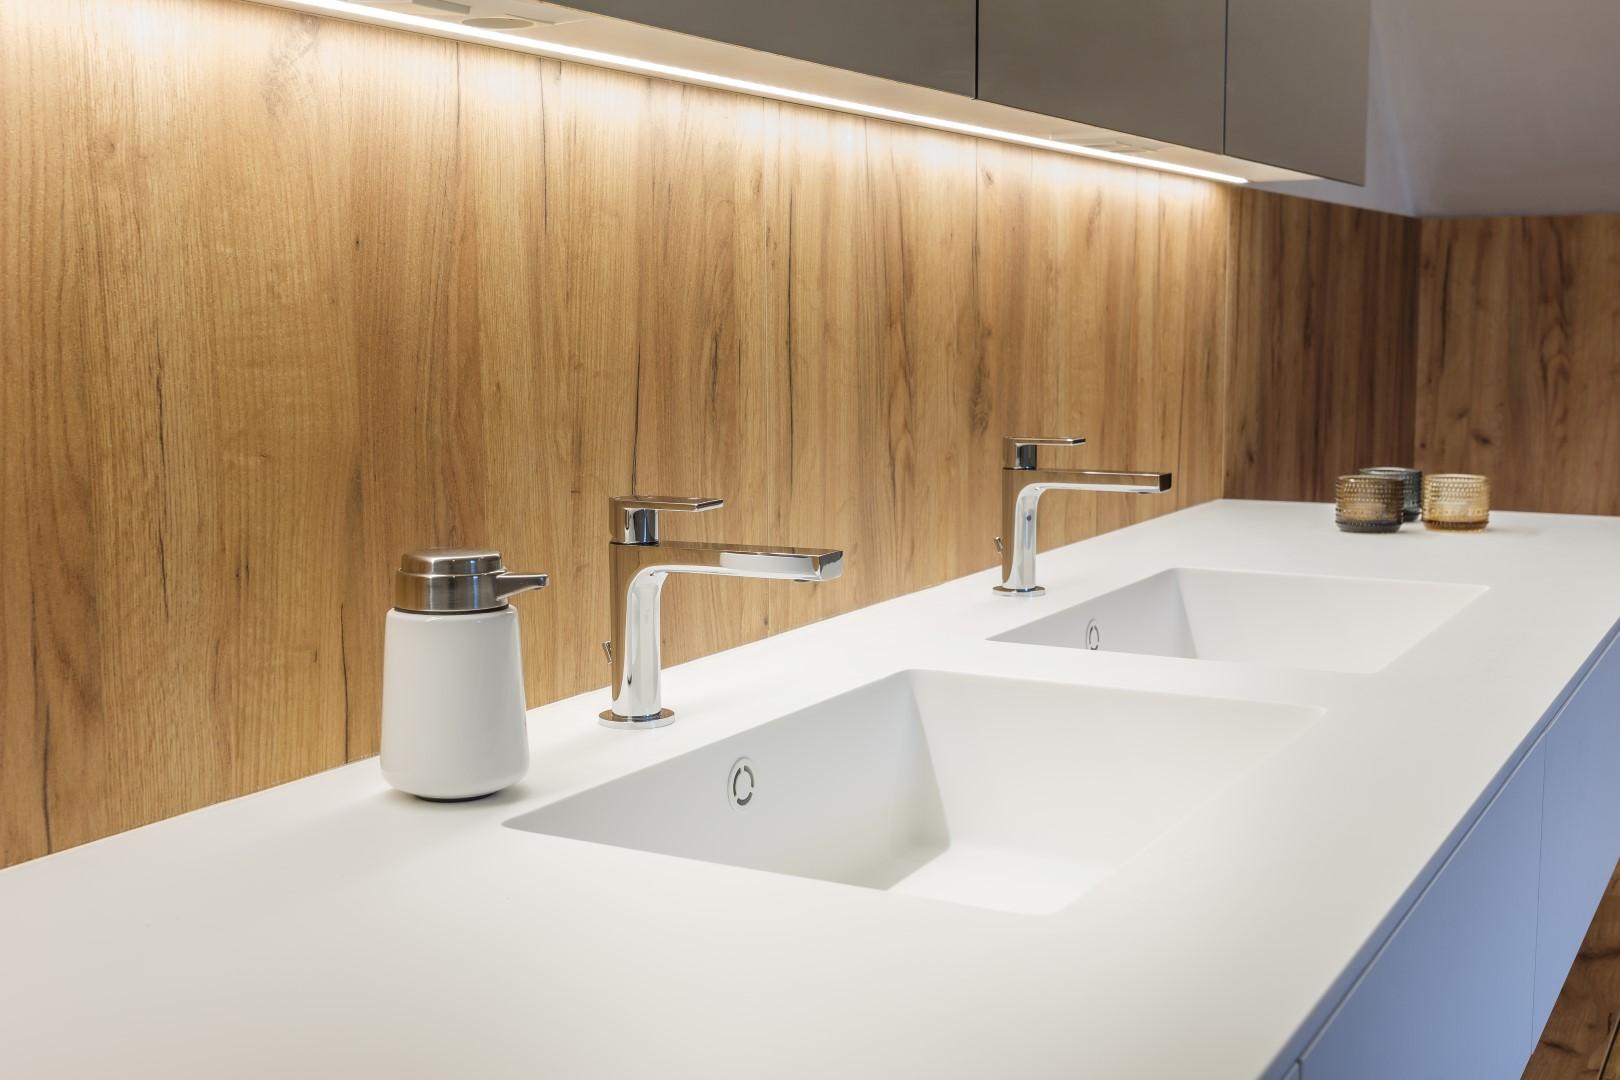 Hout Afwerking Badkamer : Badkamer met een volledige houtafwerking